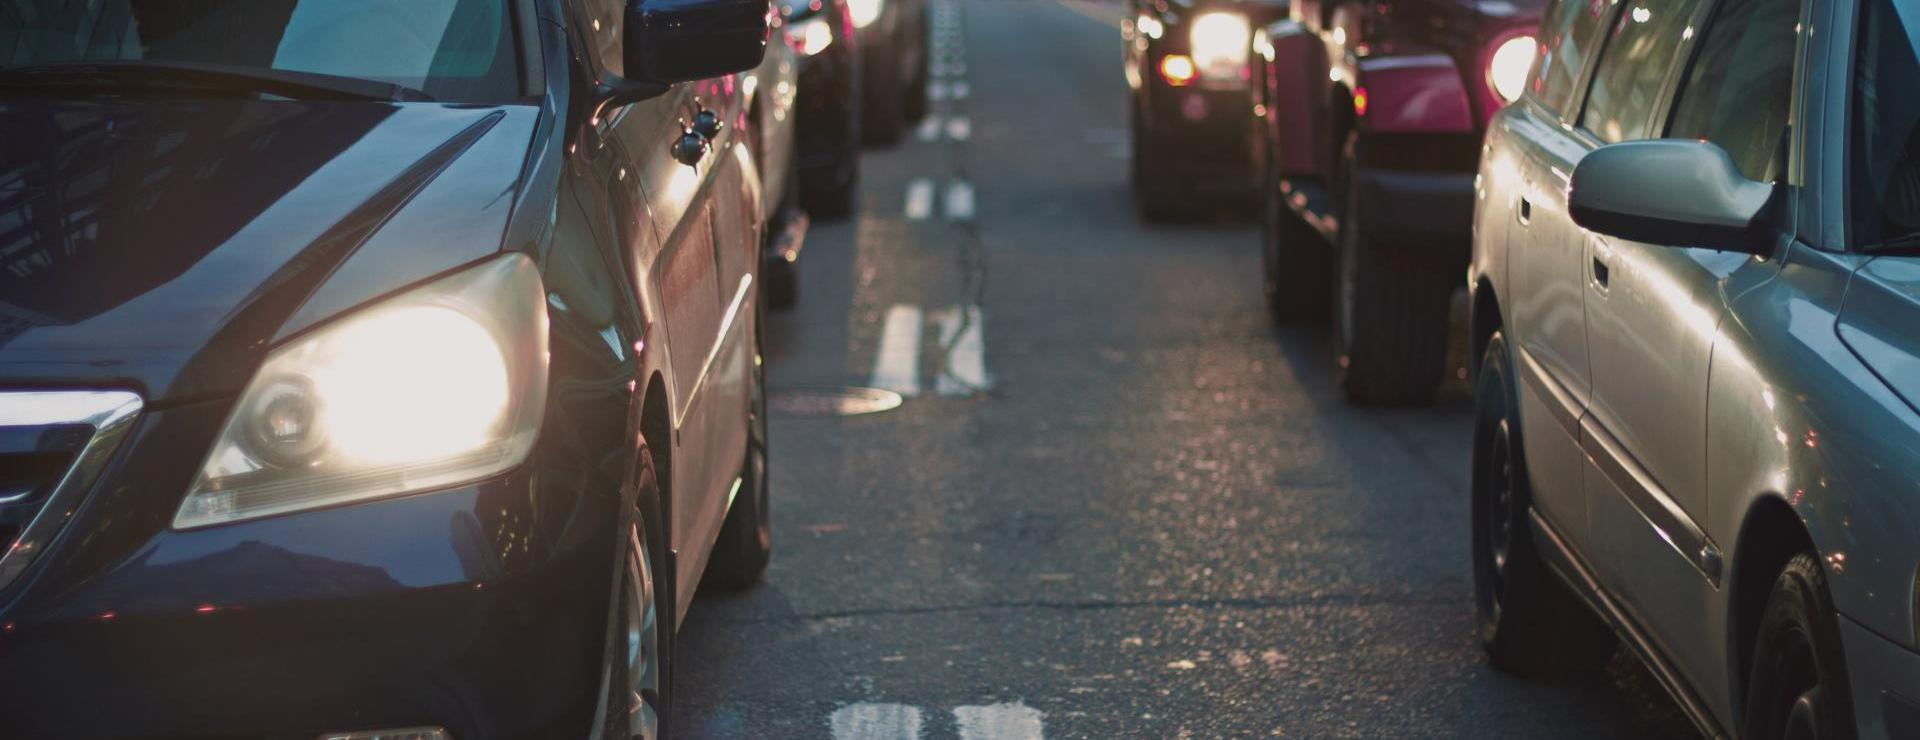 Vehicles on roadway